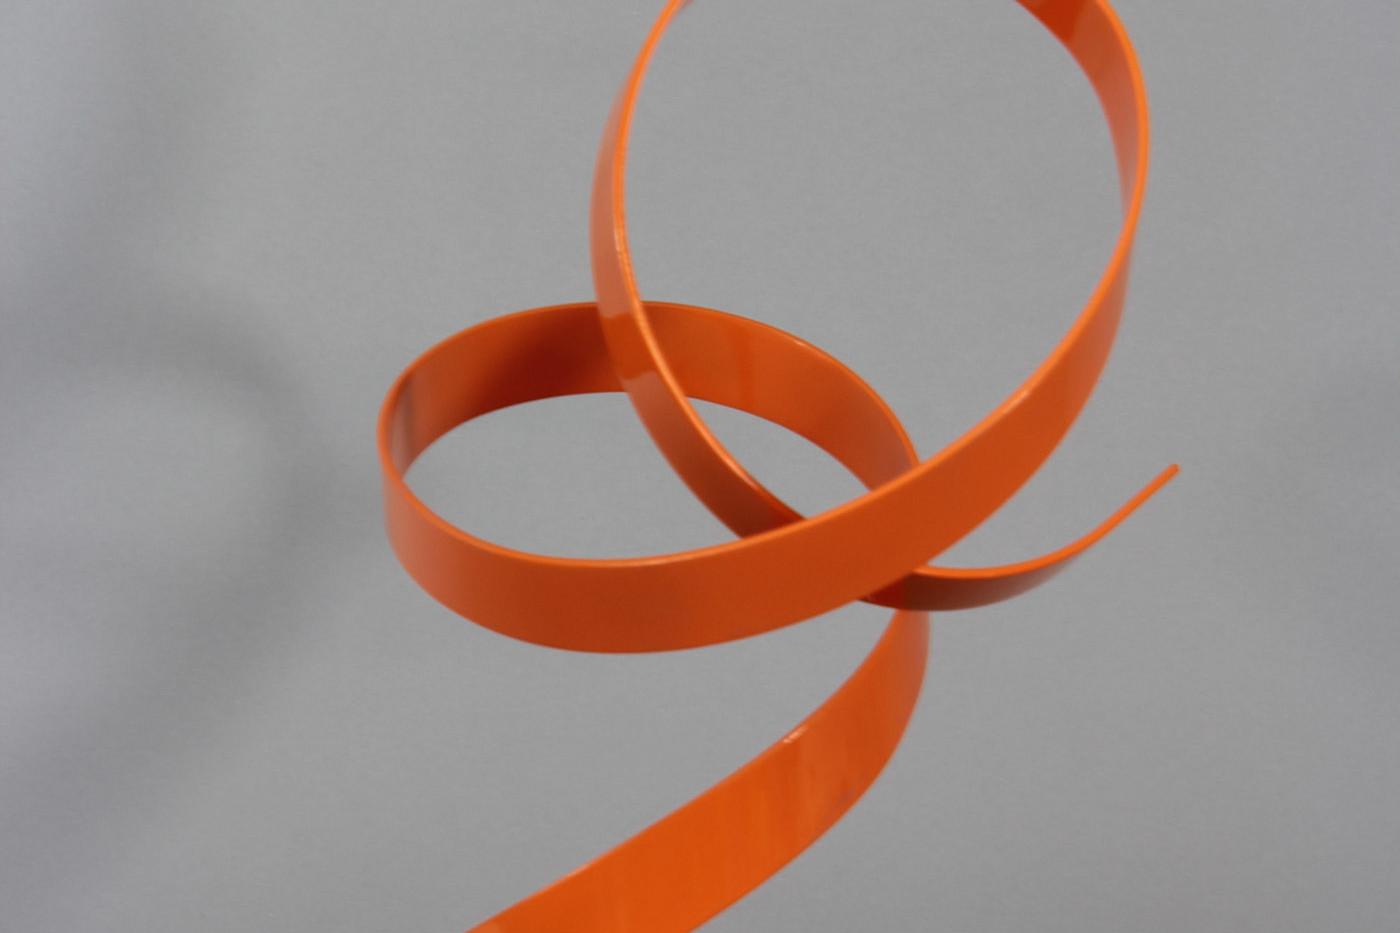 Orange-Twist-Steel-powder-coated-13-x-9-